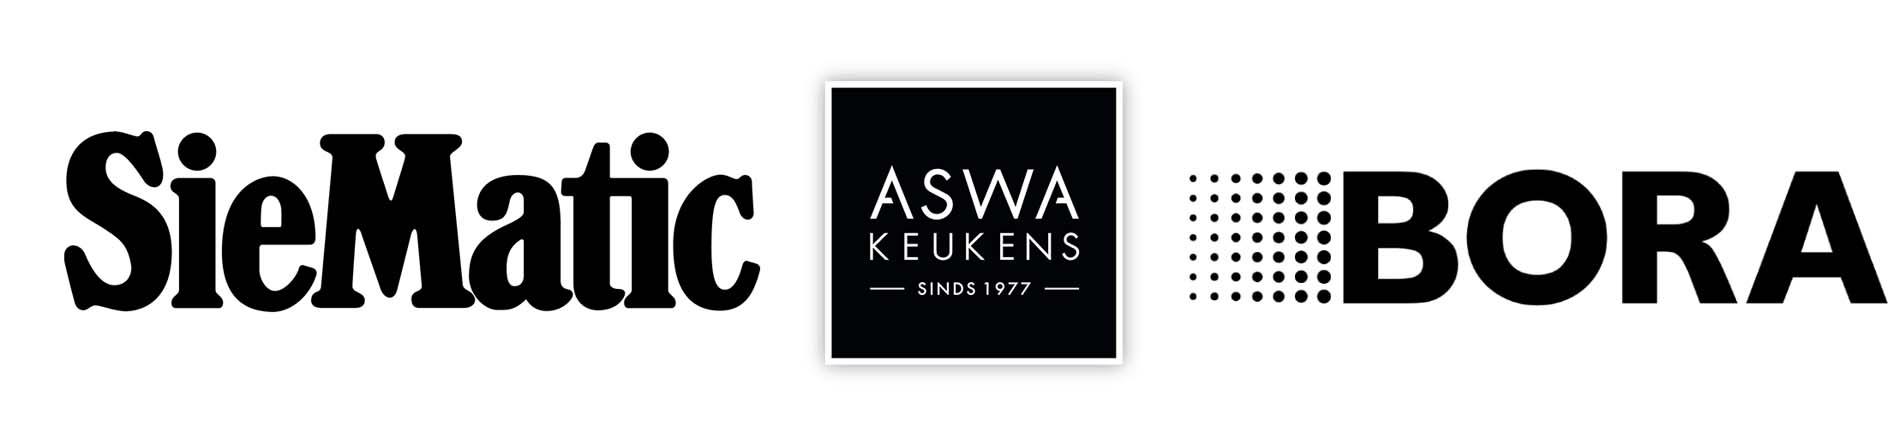 Lifestyle Event Dordrecht - Keuken Inspiratie SieMatic, BORA, Siemens & ASWA Keukens